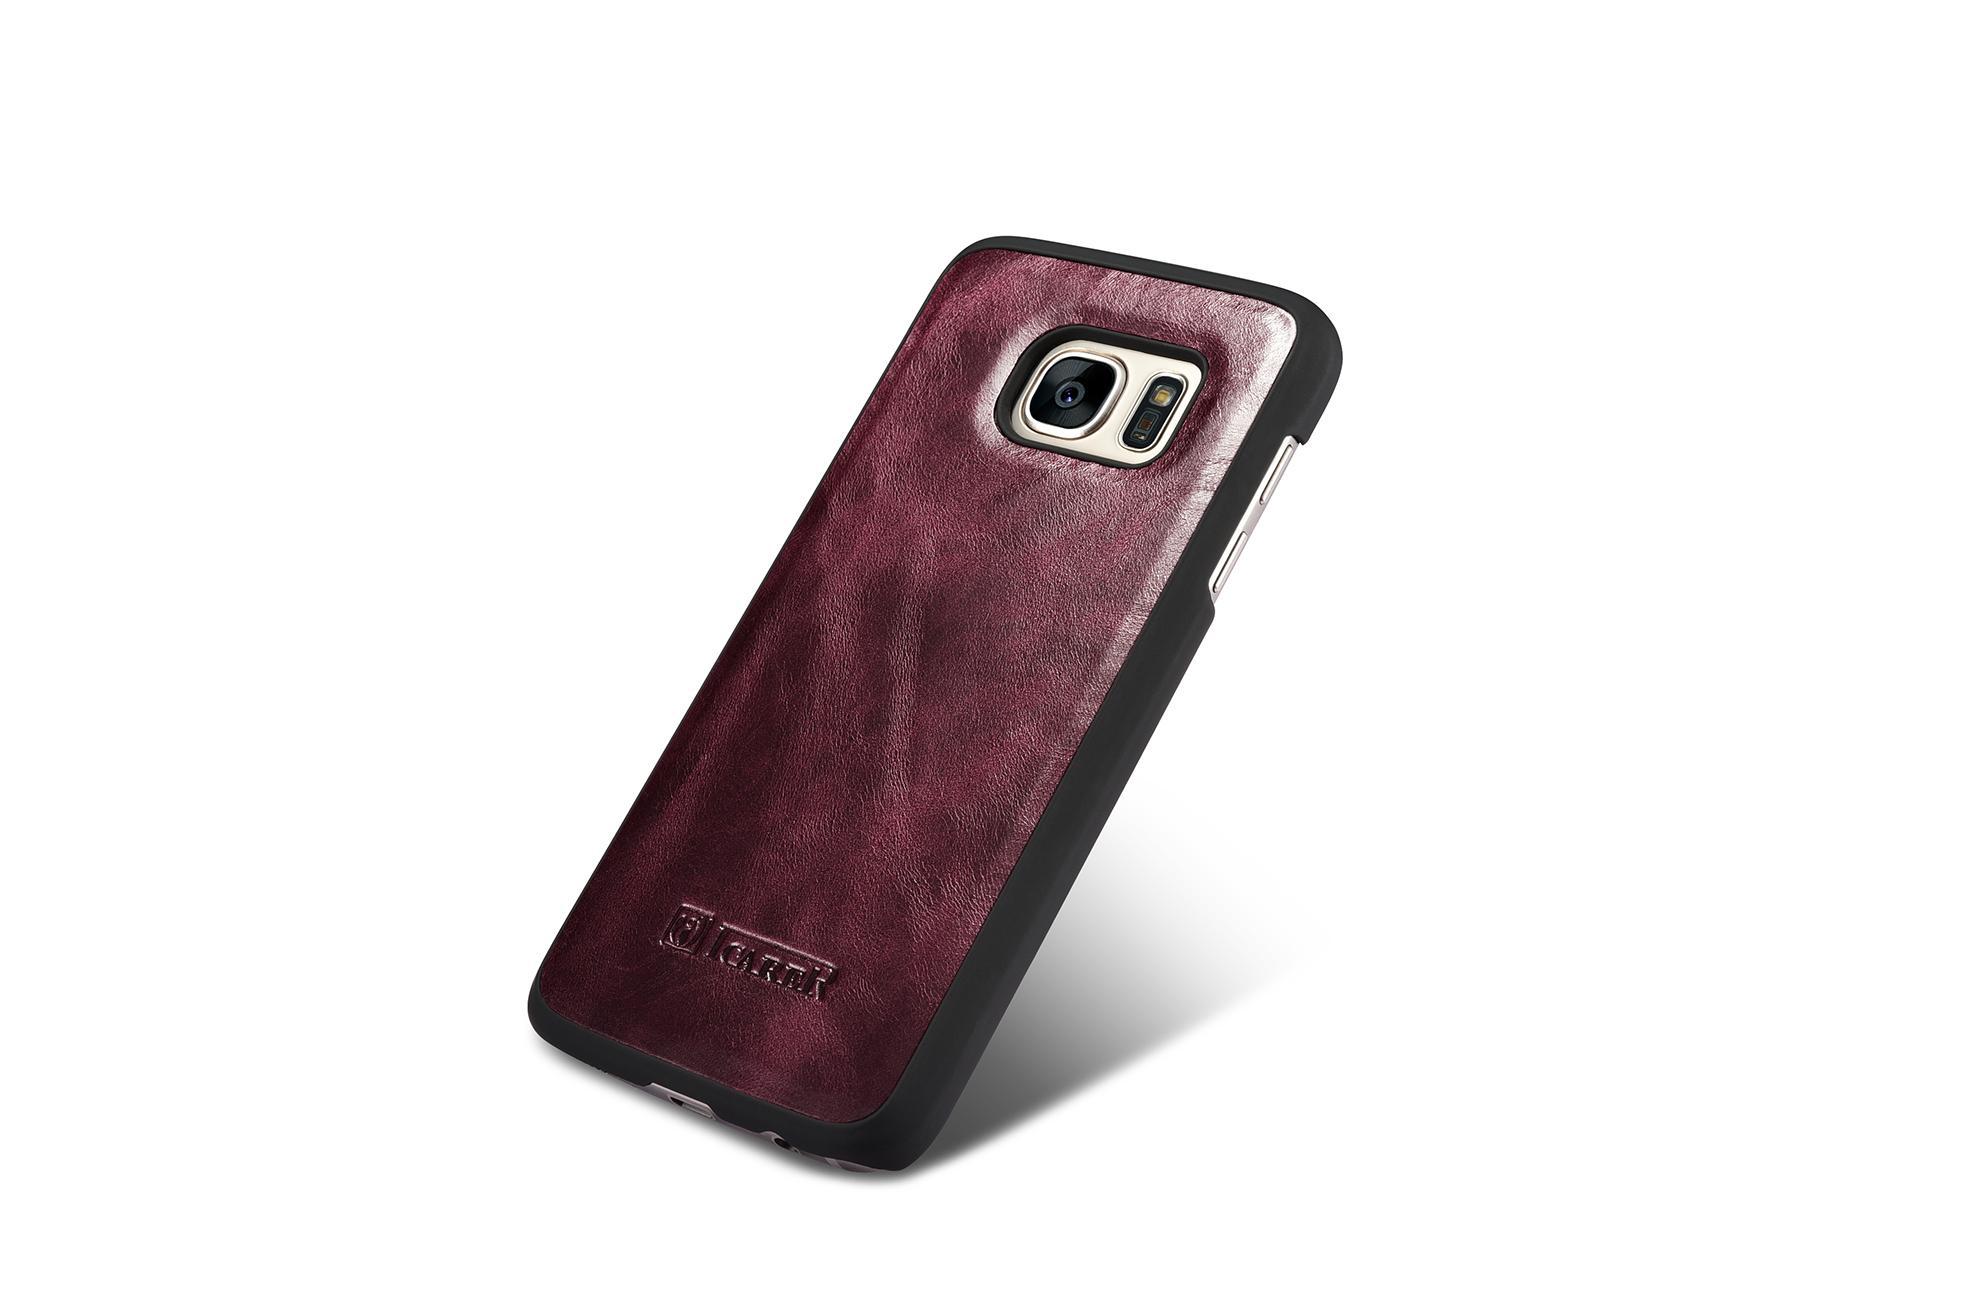 iCarer Samsung Galaxy S7 Silmarillion Leather Detachable 2in1 Wallet Folio Case 6